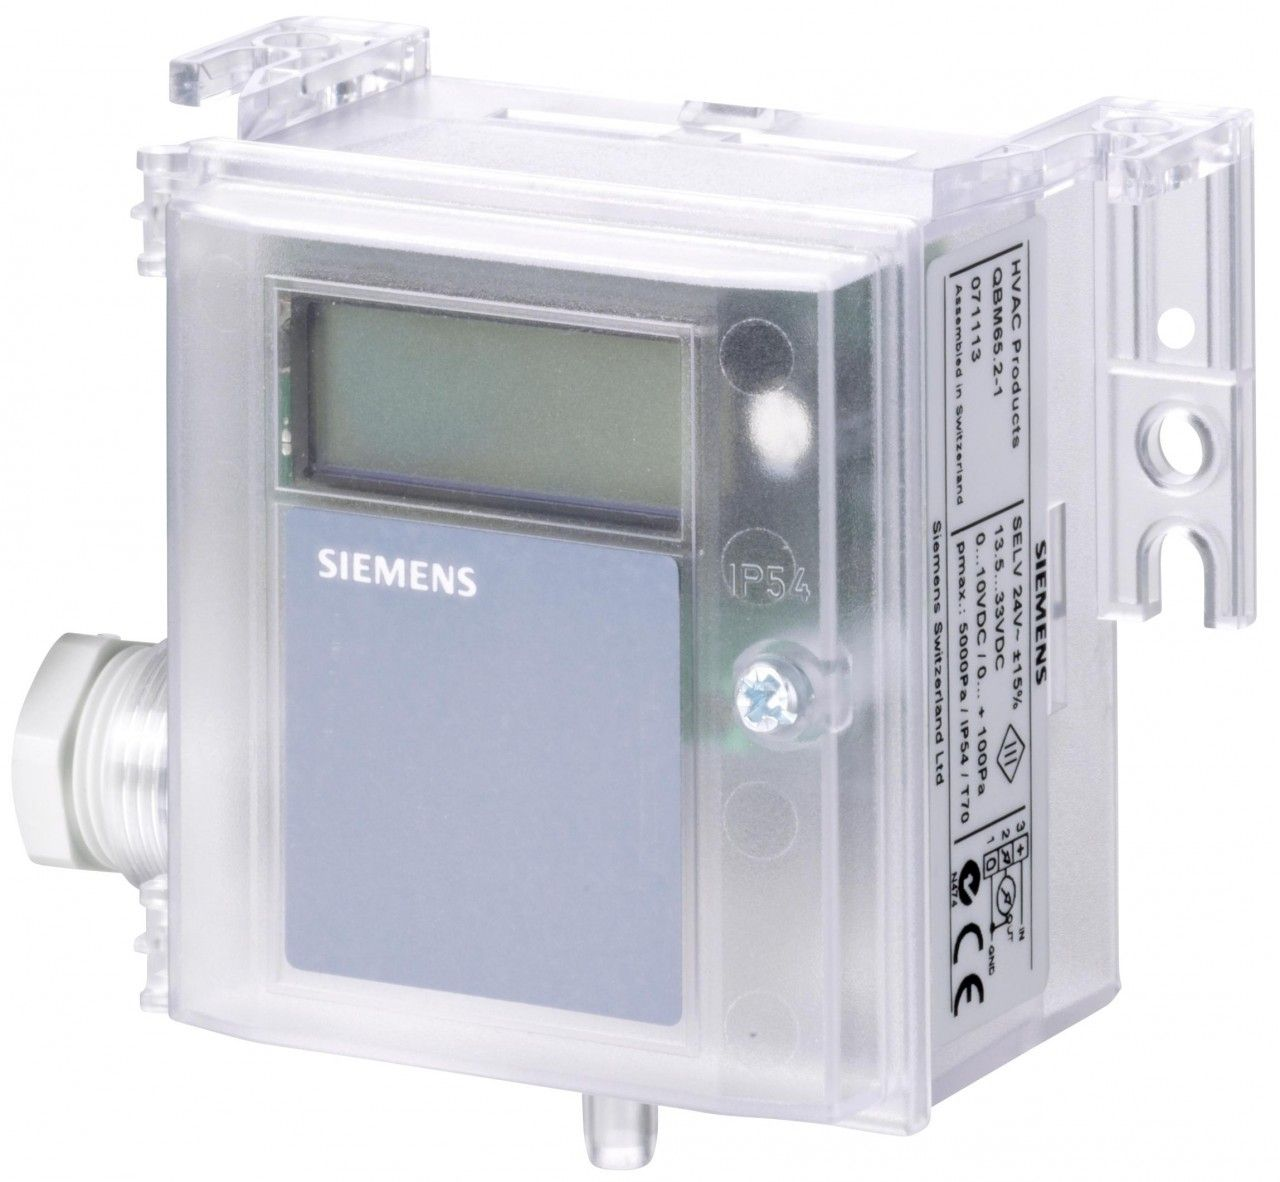 Siemens QBM30205D